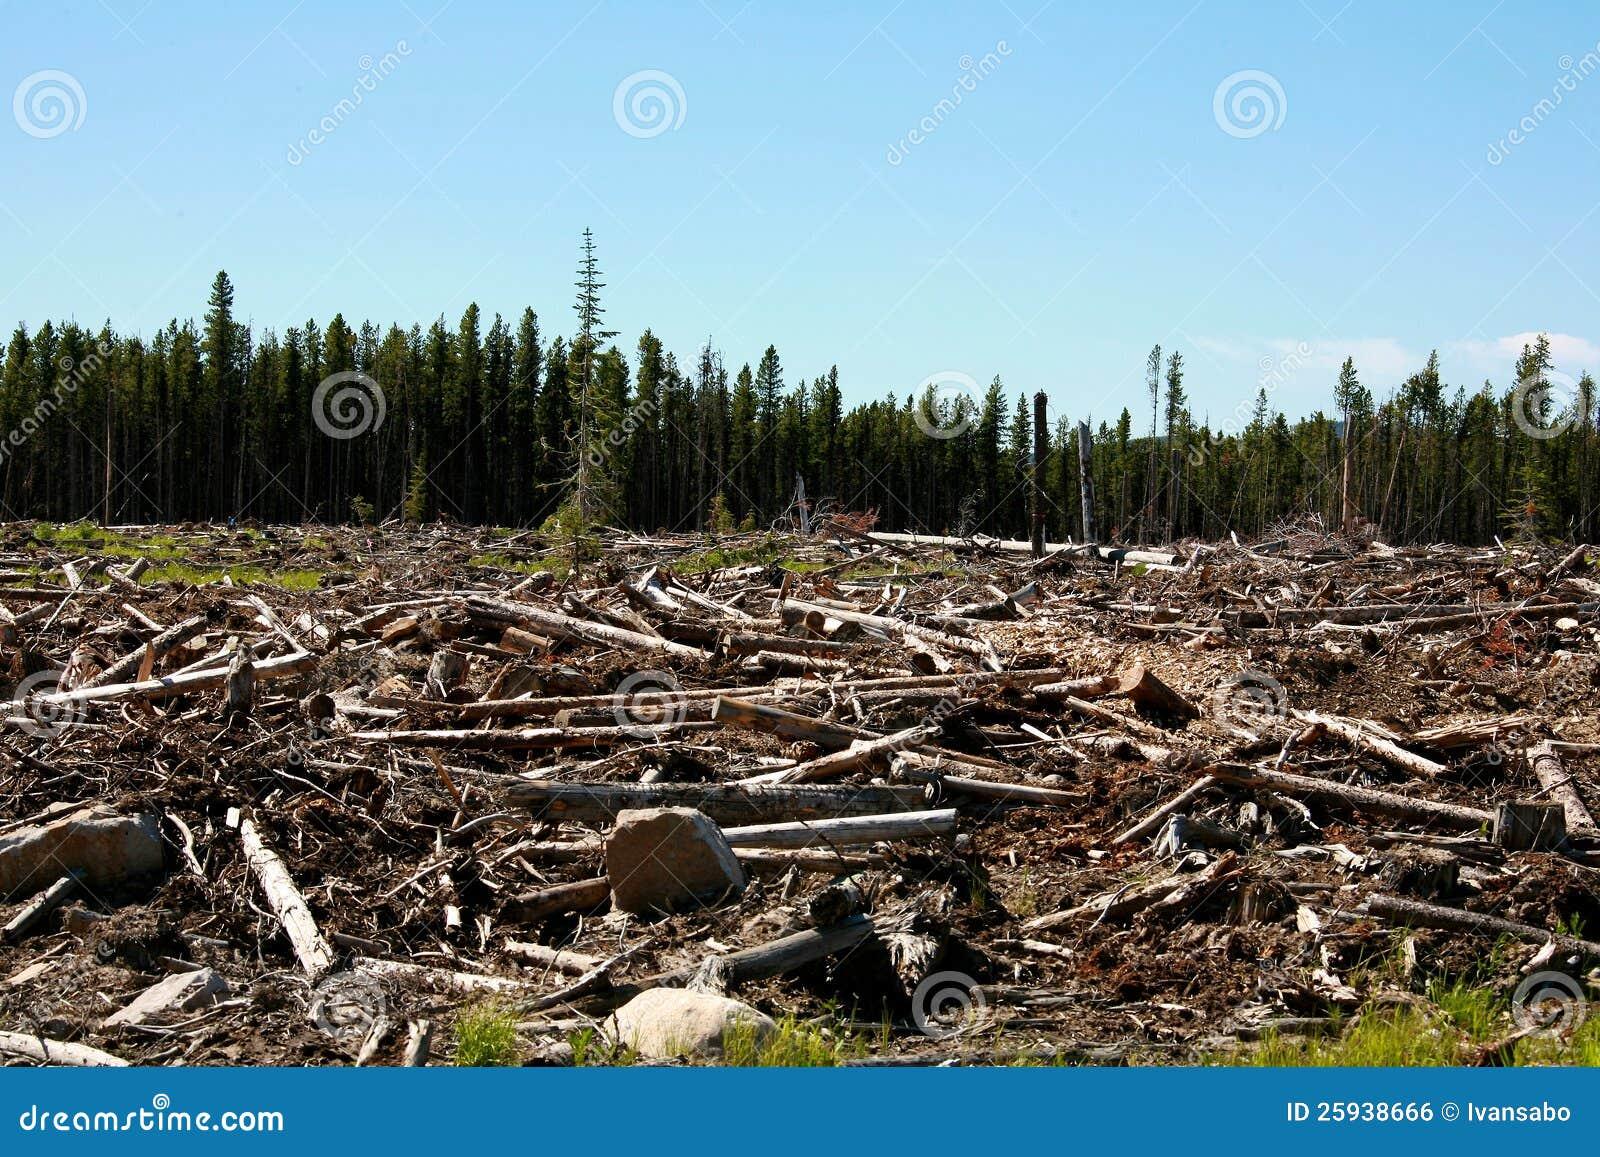 Deforestation Stock Photo Image Of Global Nature Trunk